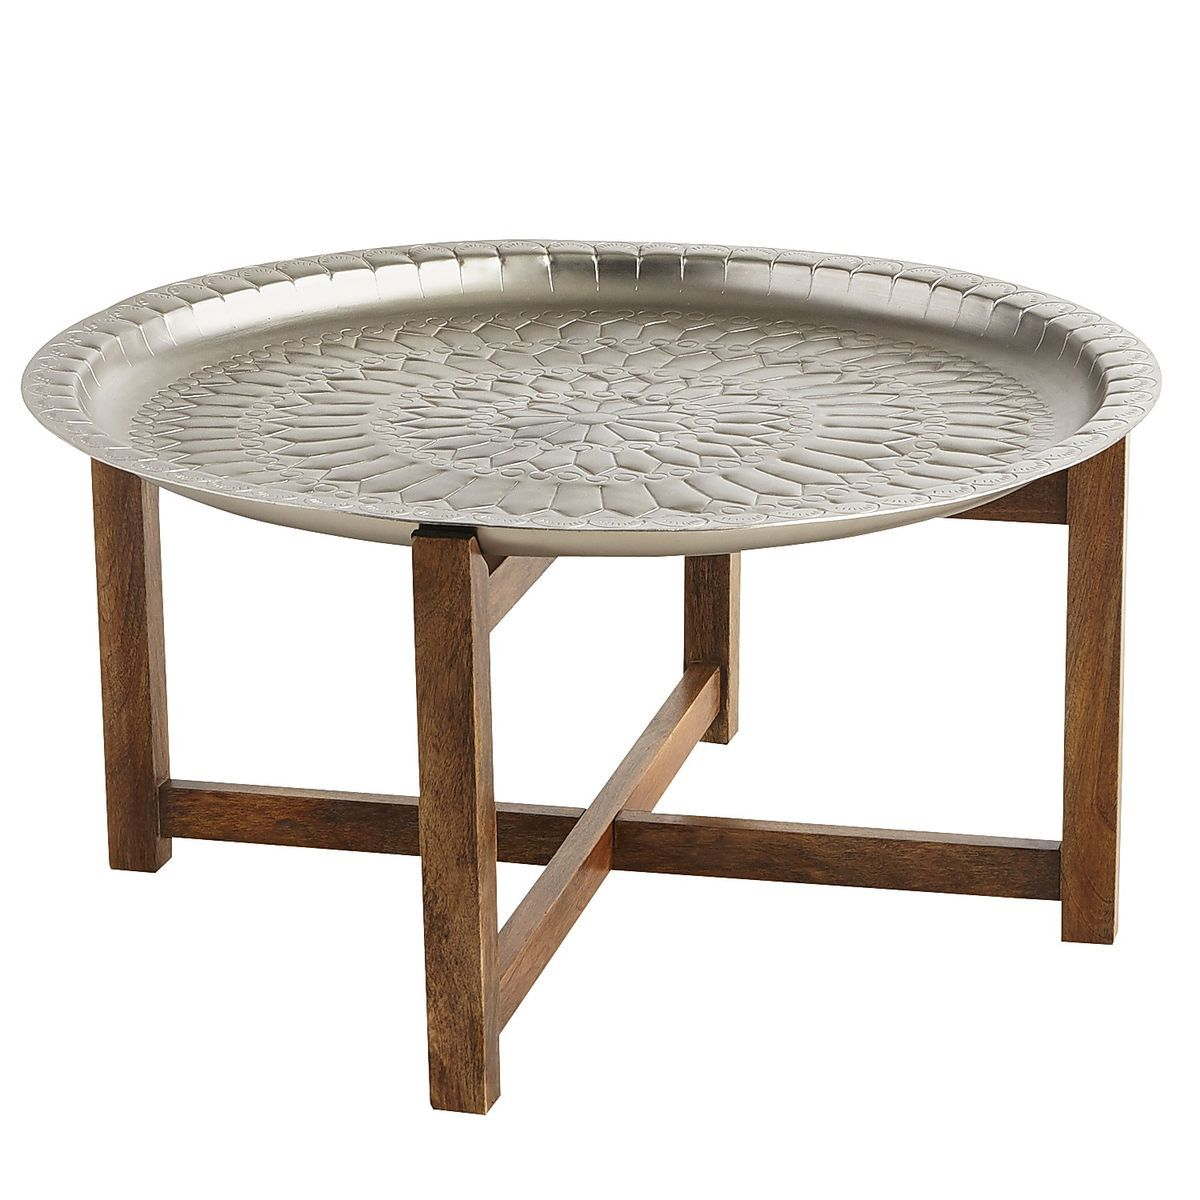 Moroccan Coffee Table In 2020 Moroccan Table Unique Coffee